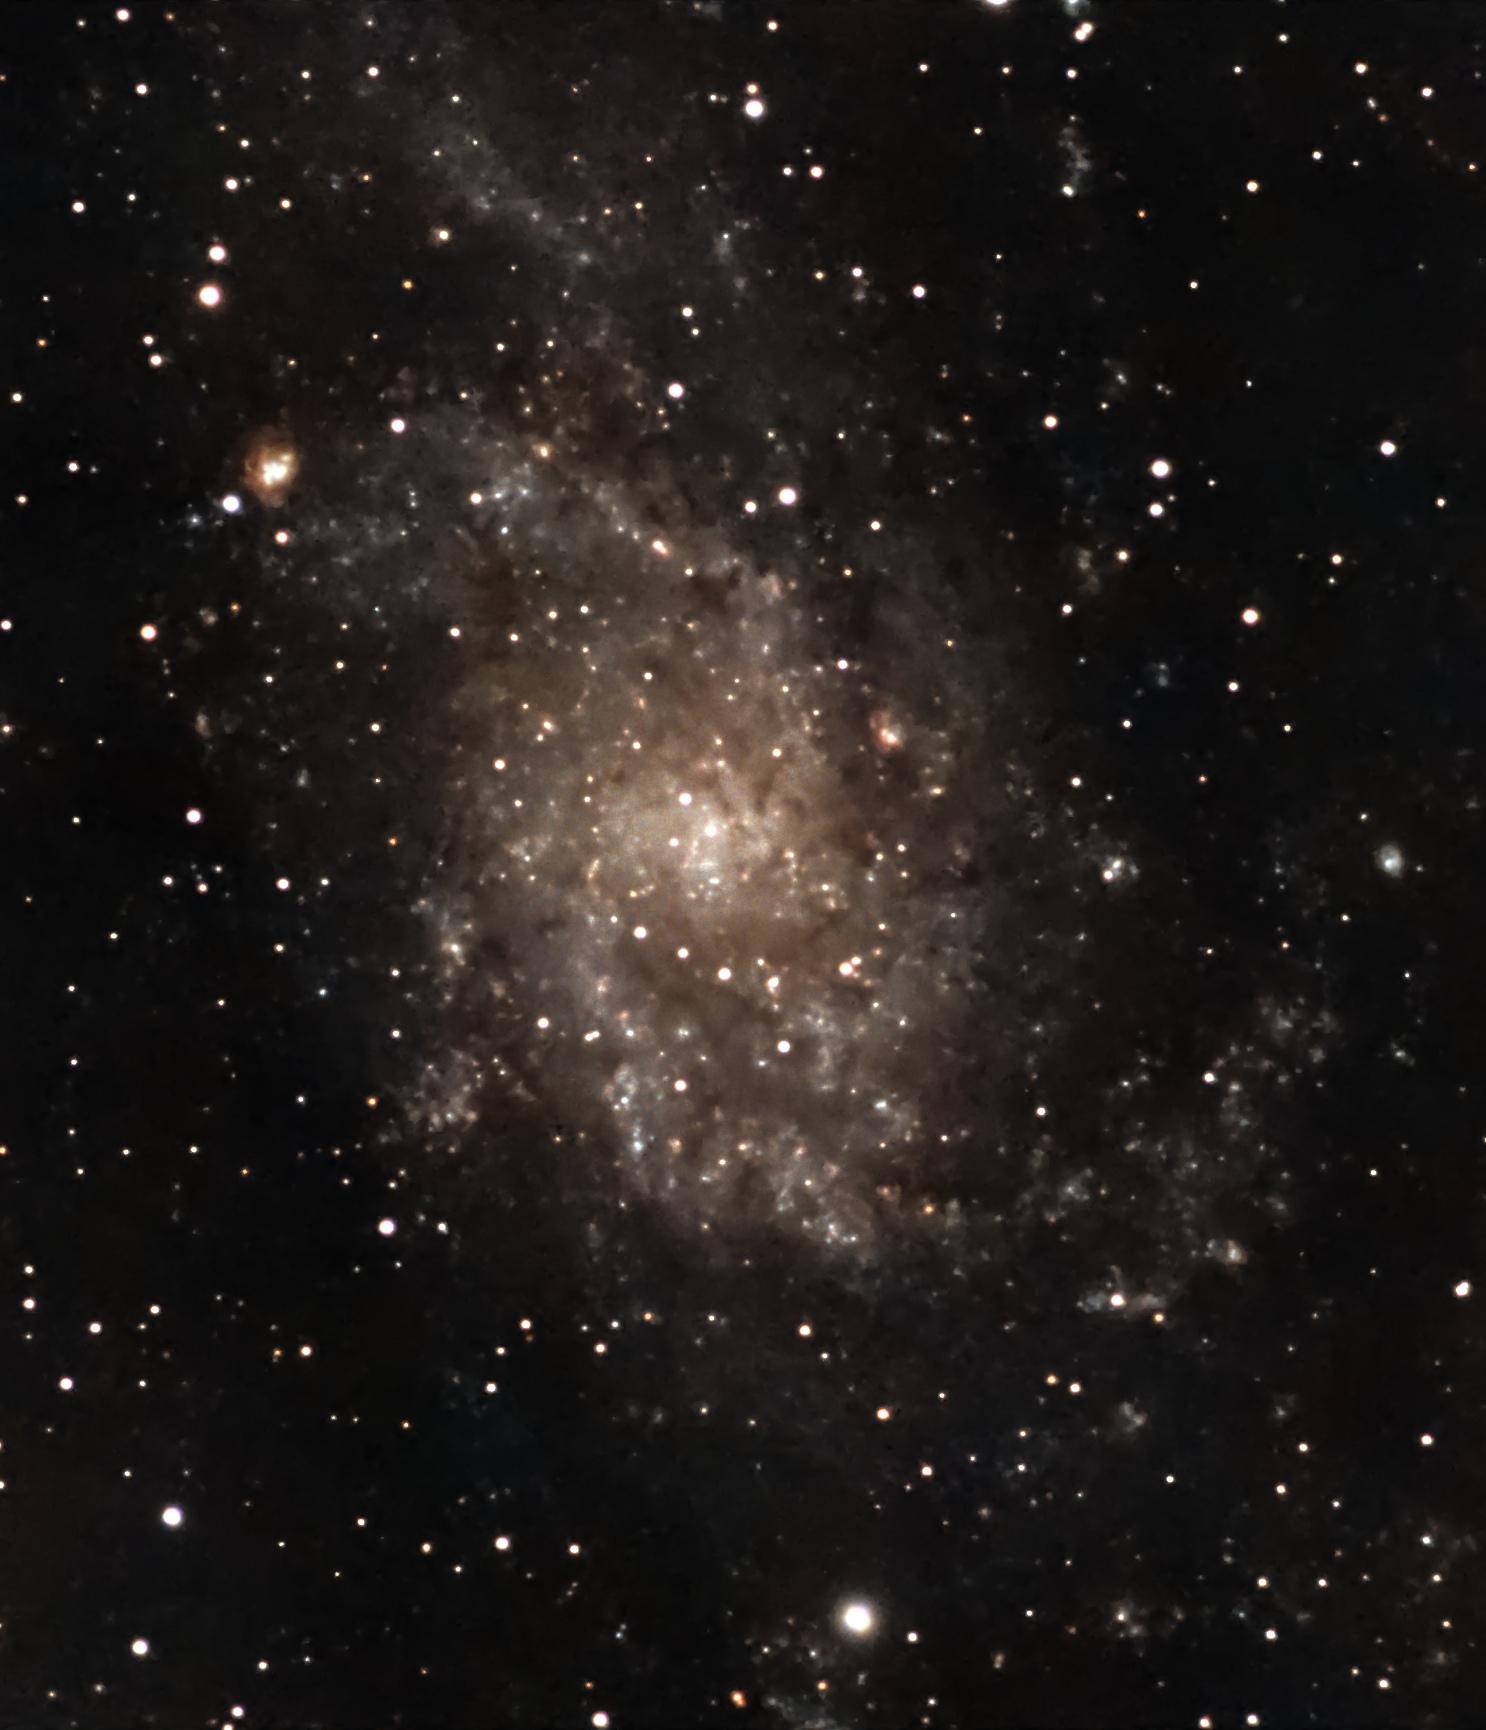 M33_Triangle_4nights_DSS_Siril_AP.jpg